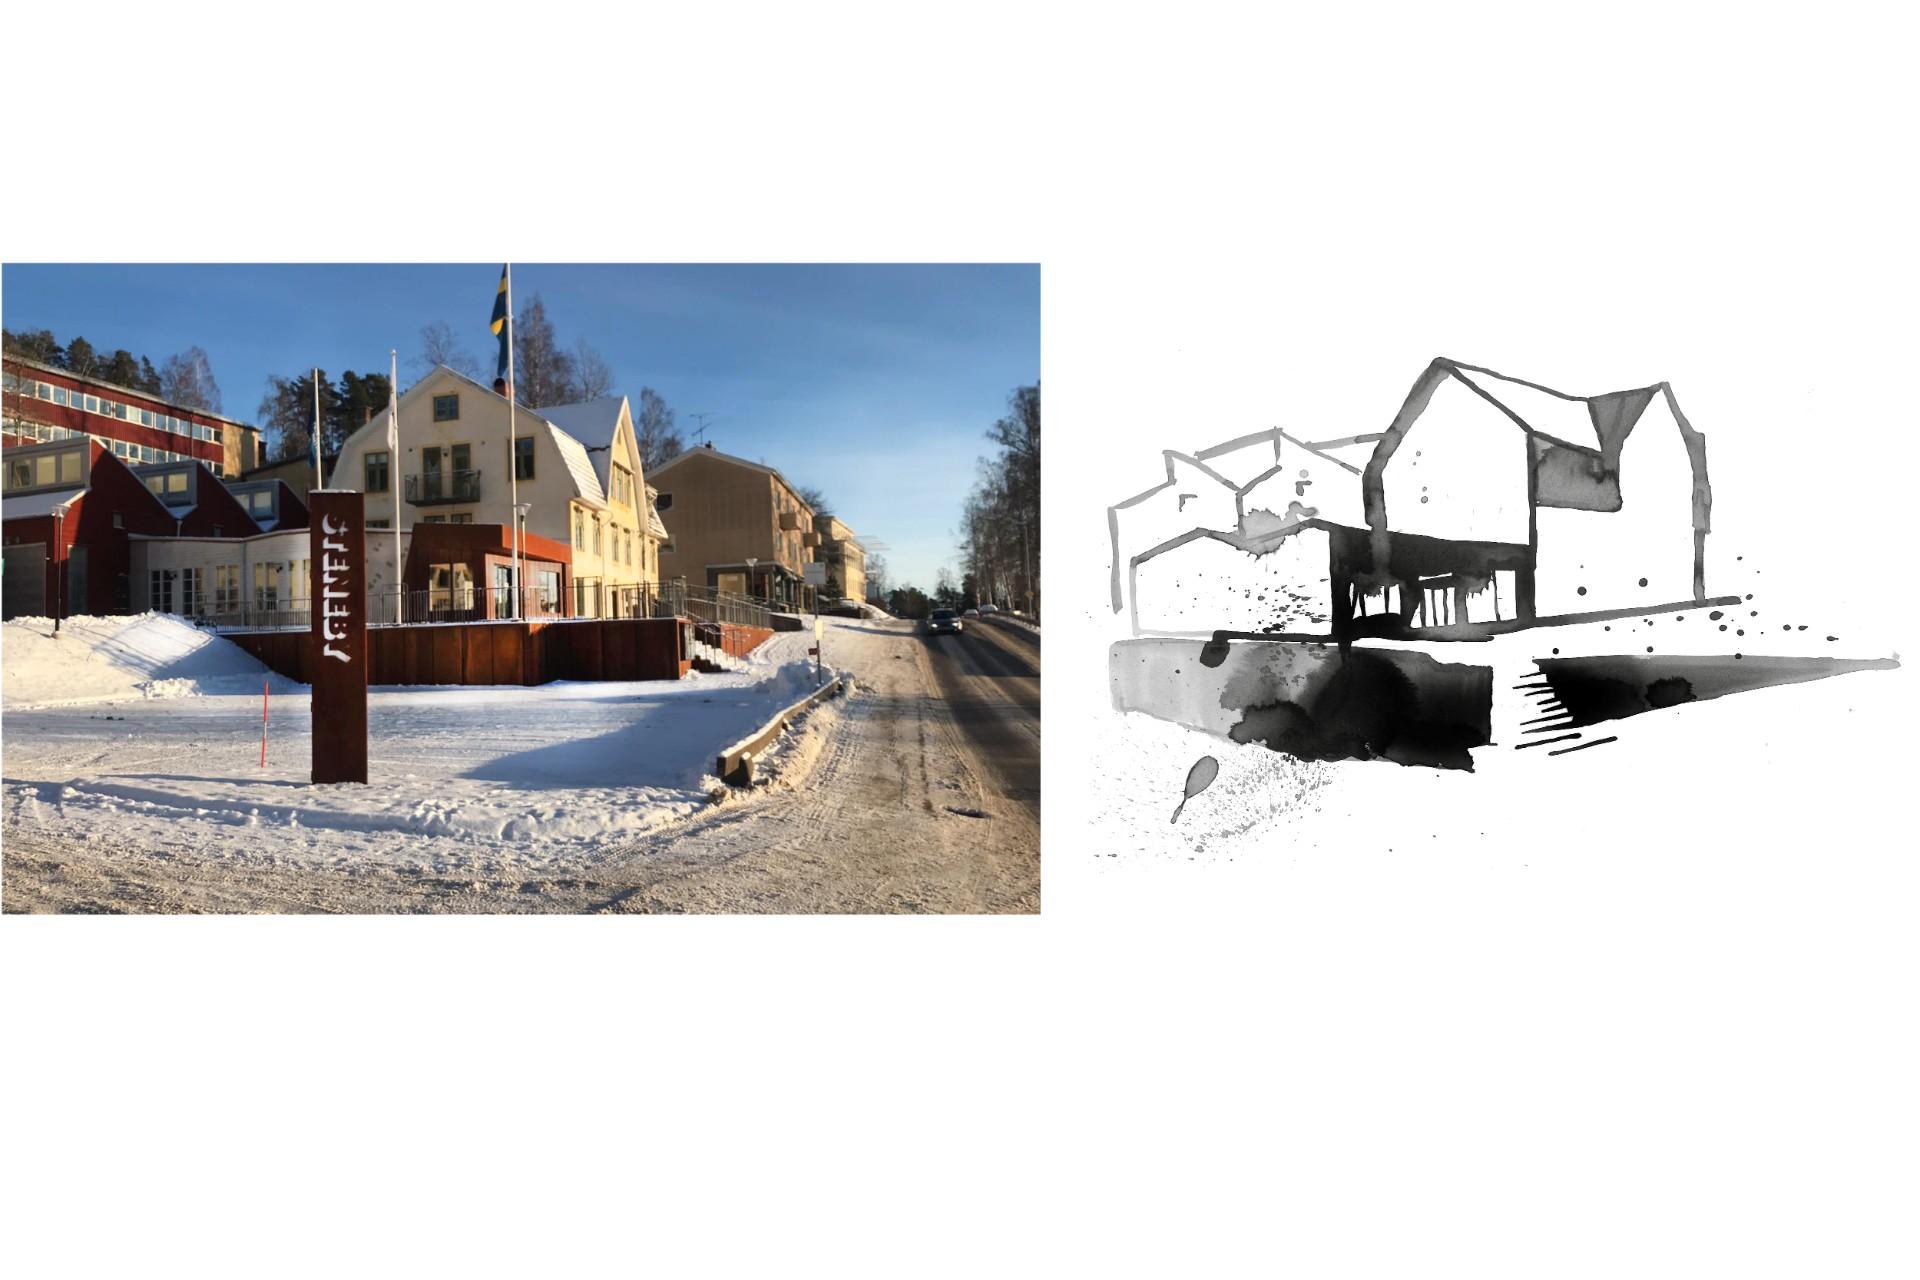 esteneby-dals-folkbibliotek7